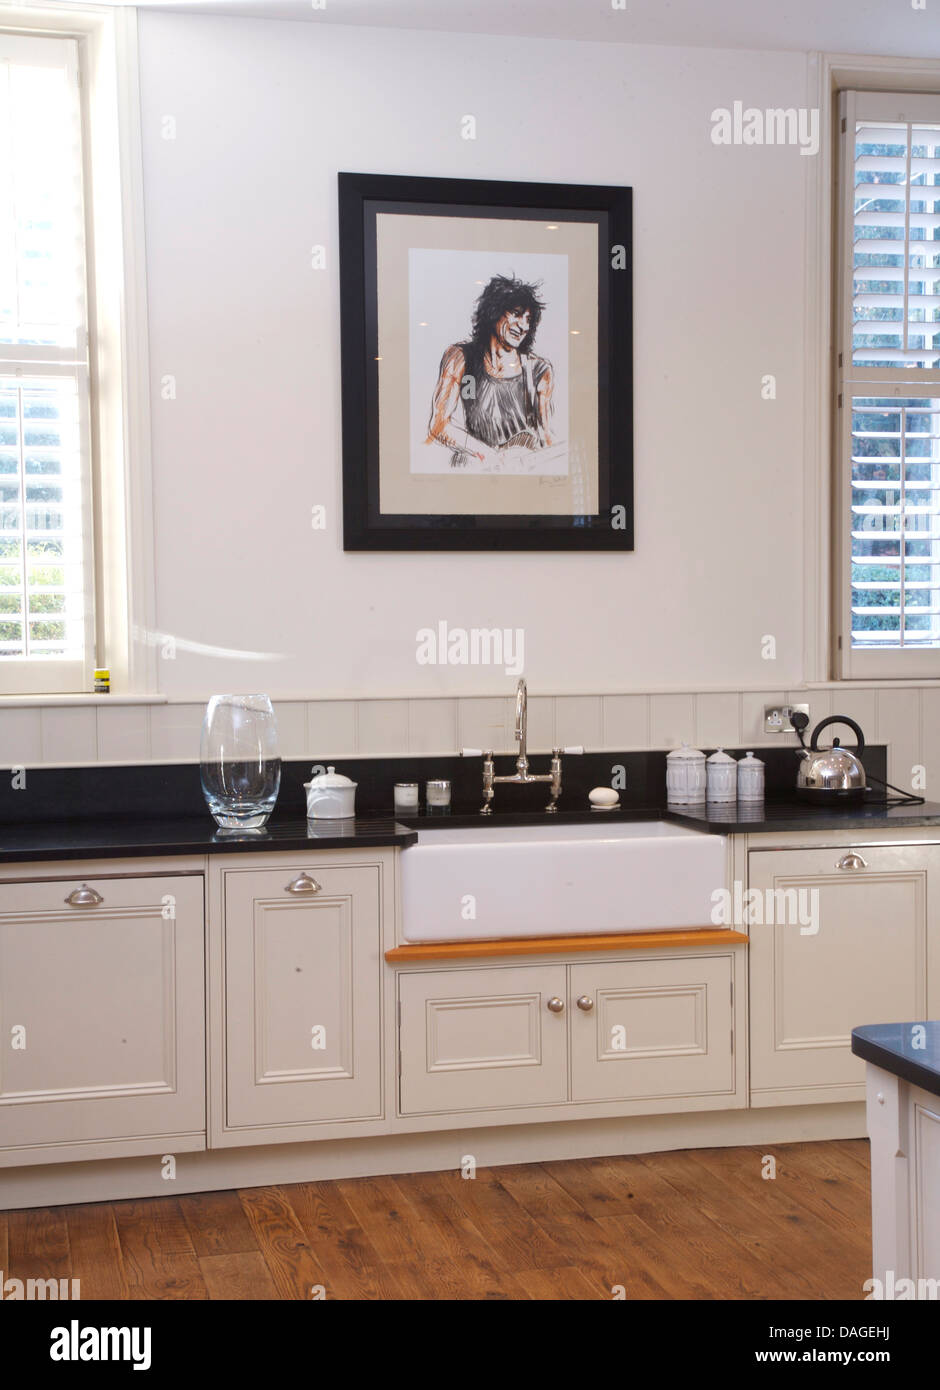 White Kitchen Units Black Worktop black worktops stock photos & black worktops stock images - alamy